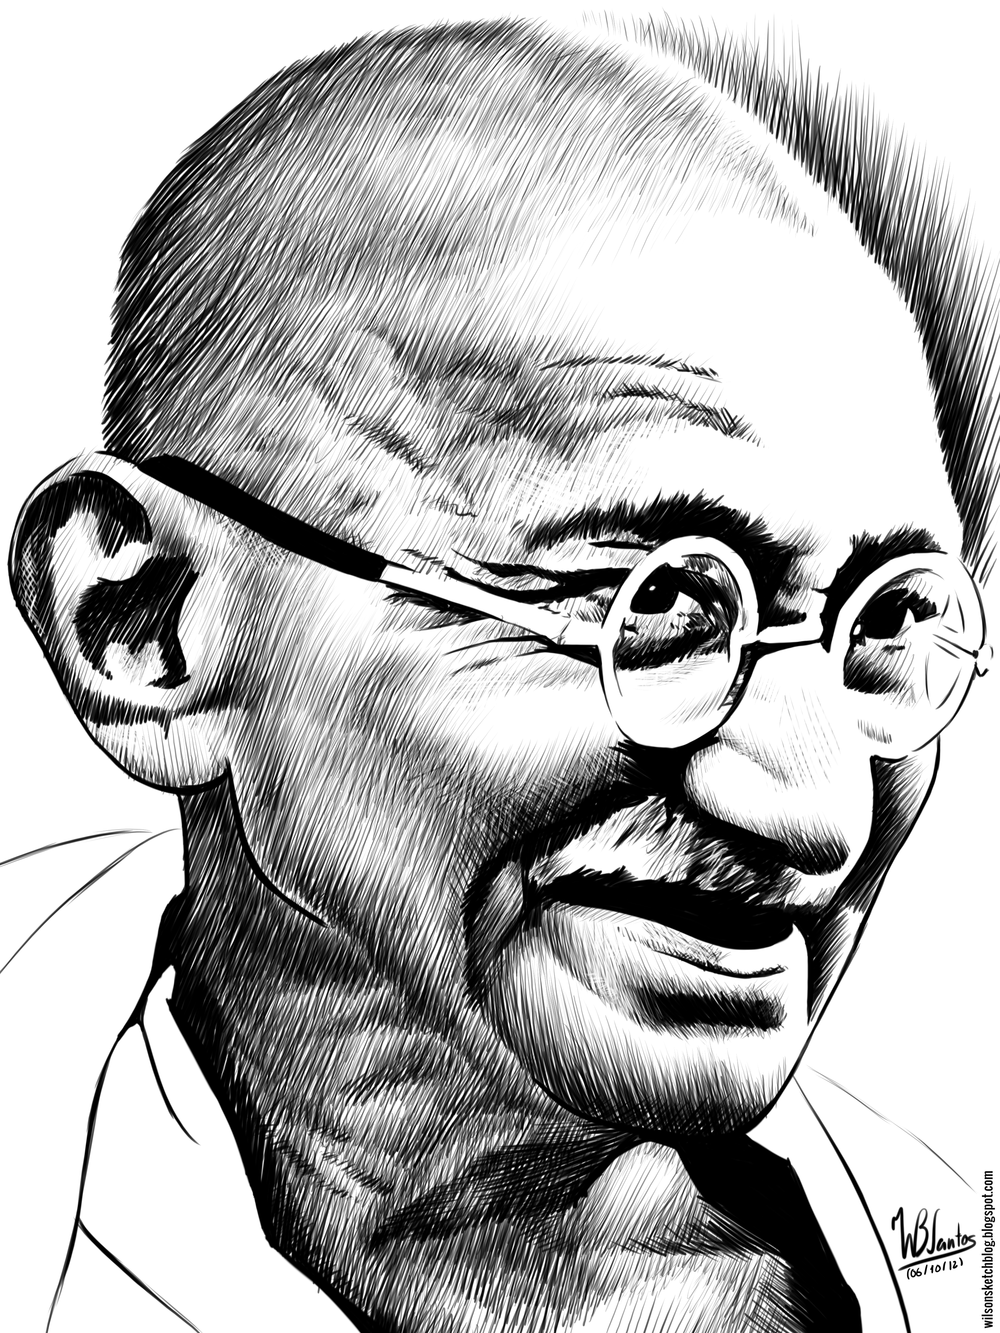 Mahtma gandhi mahatma gandhi photos pencil shading shading drawing pencil drawings